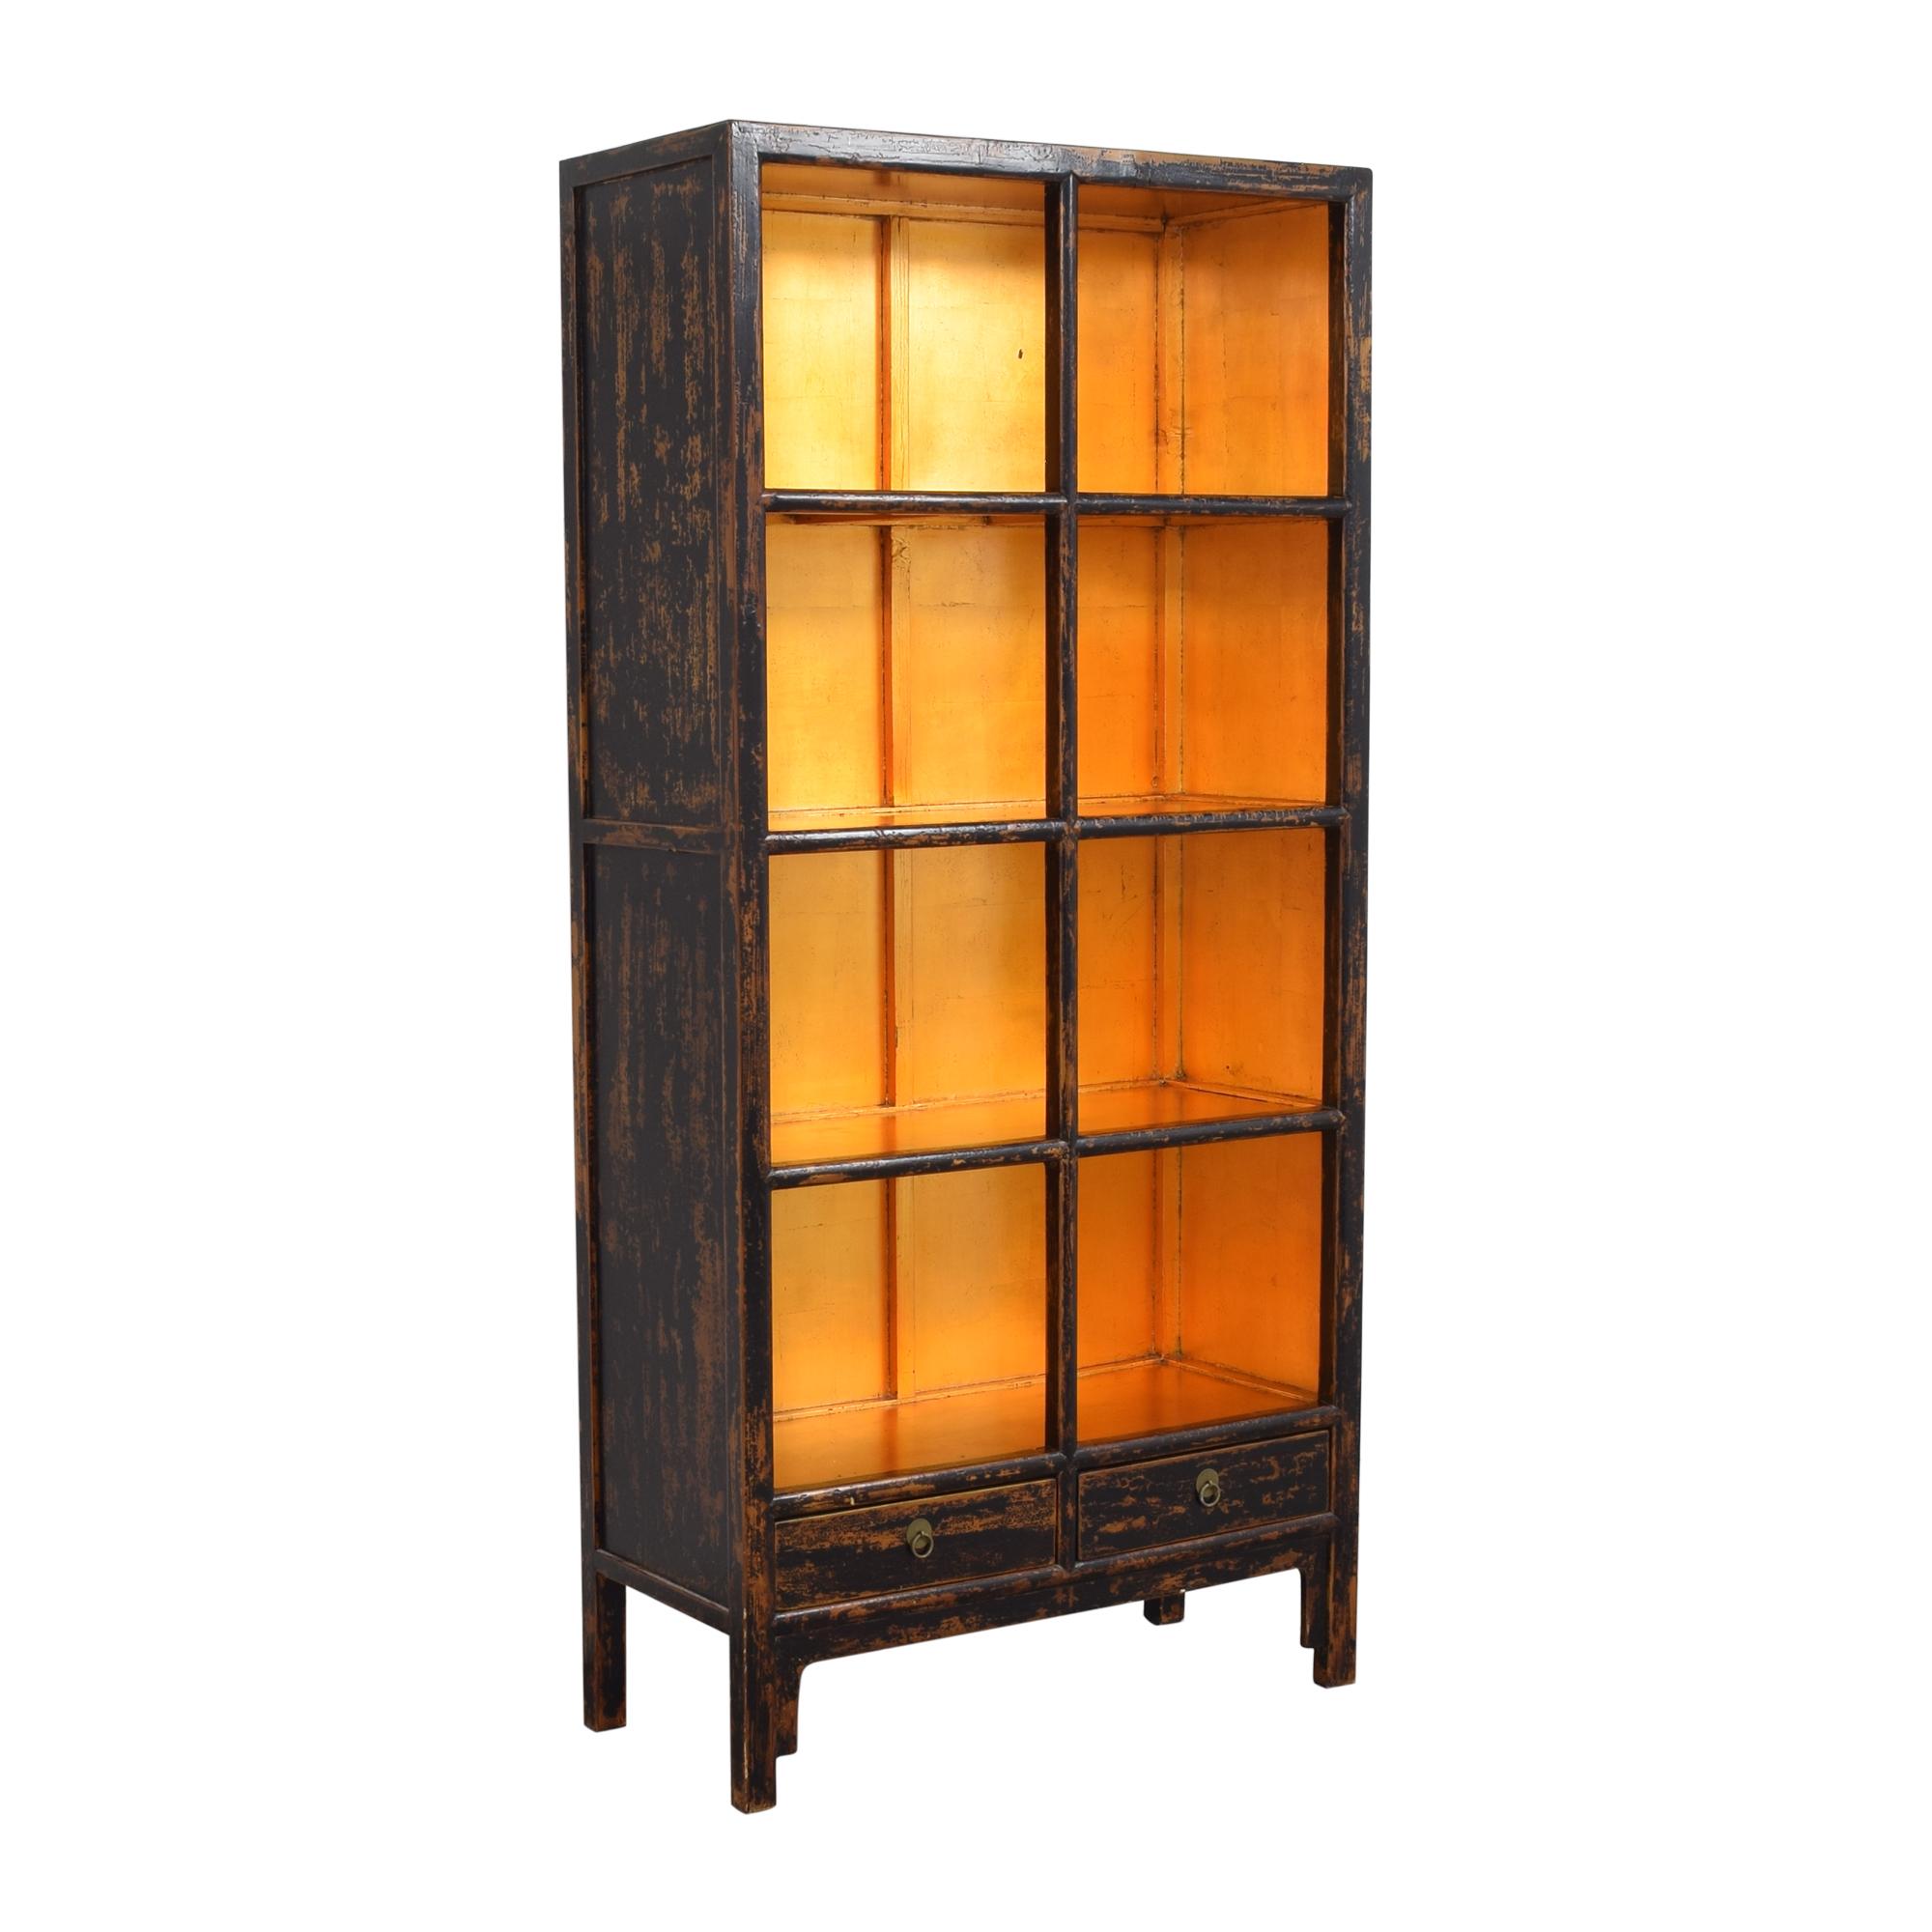 Decorative Four Shelf Bookcase ma